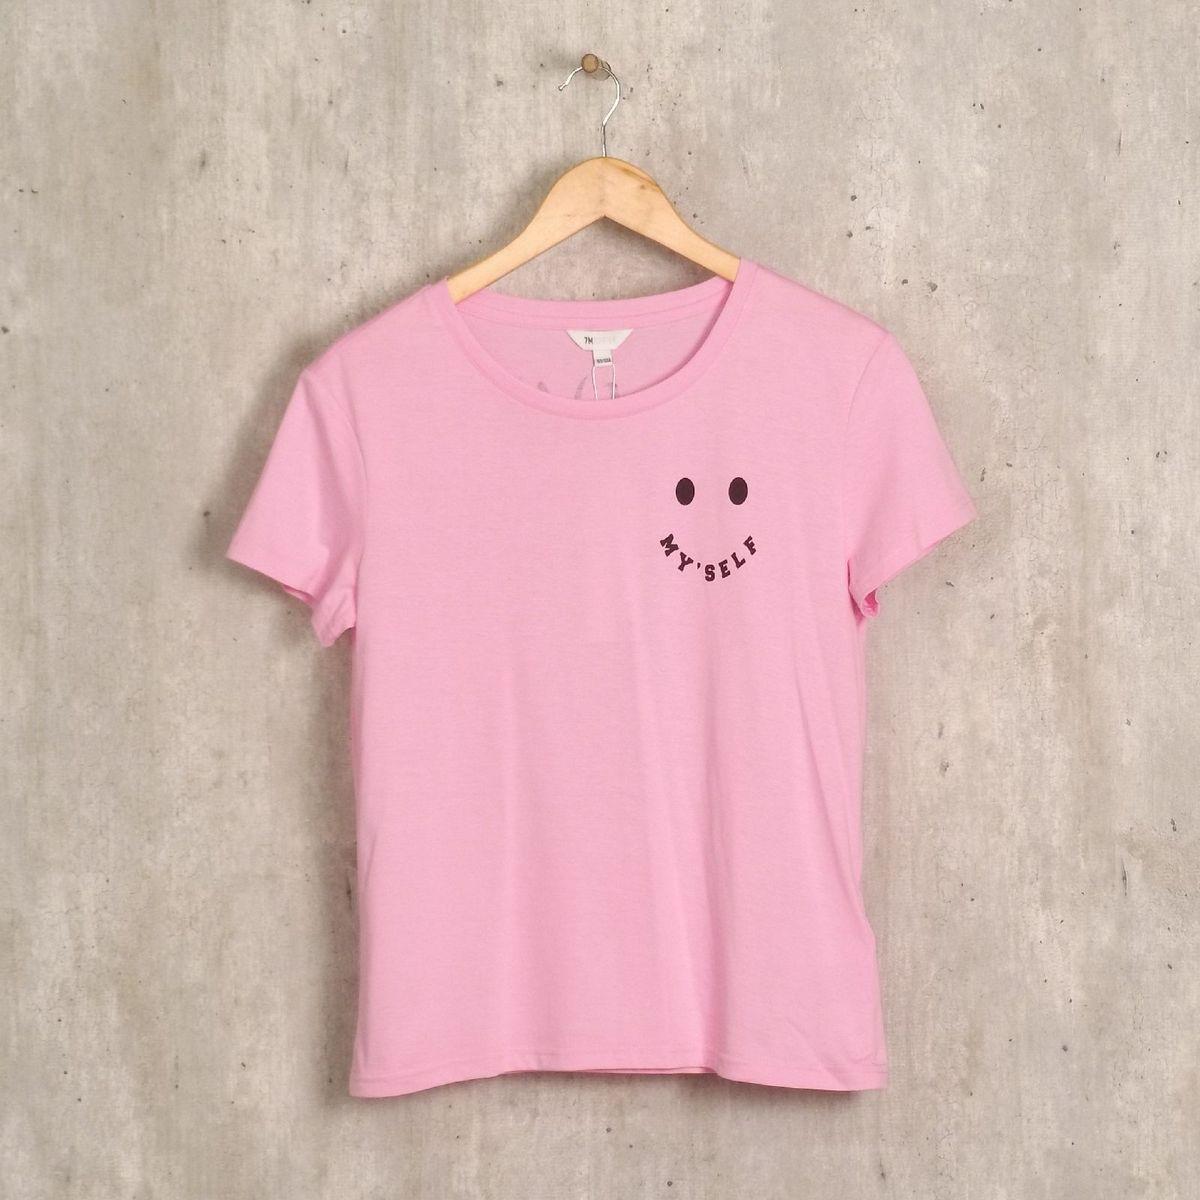 camiseta rosa 7modifier - camisetas 7 modifier